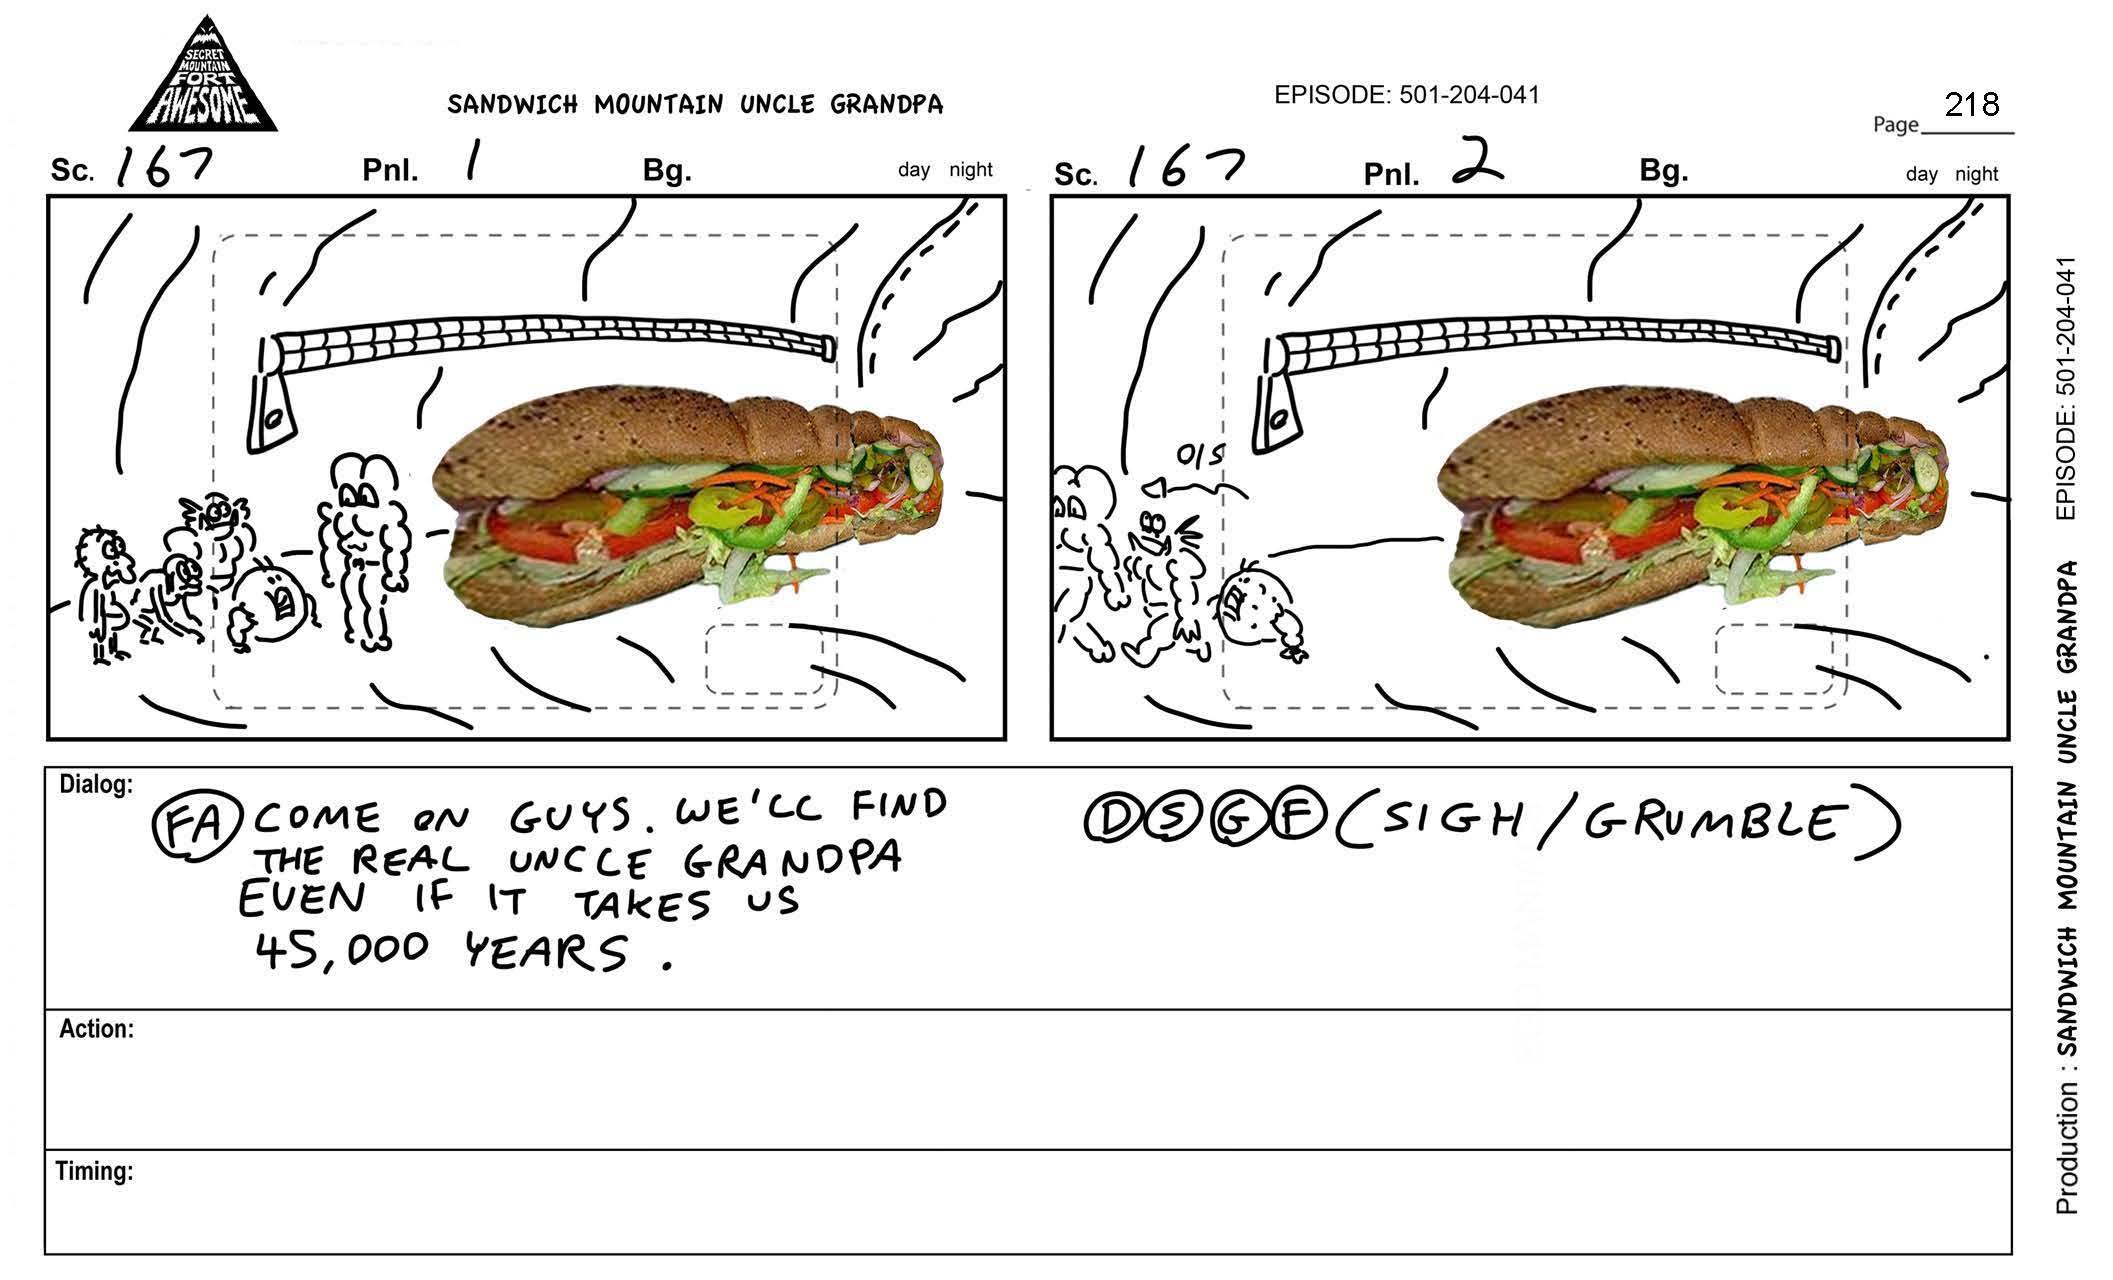 SMFA_SandwichMountainUncleGrandpa_Page_218.jpg